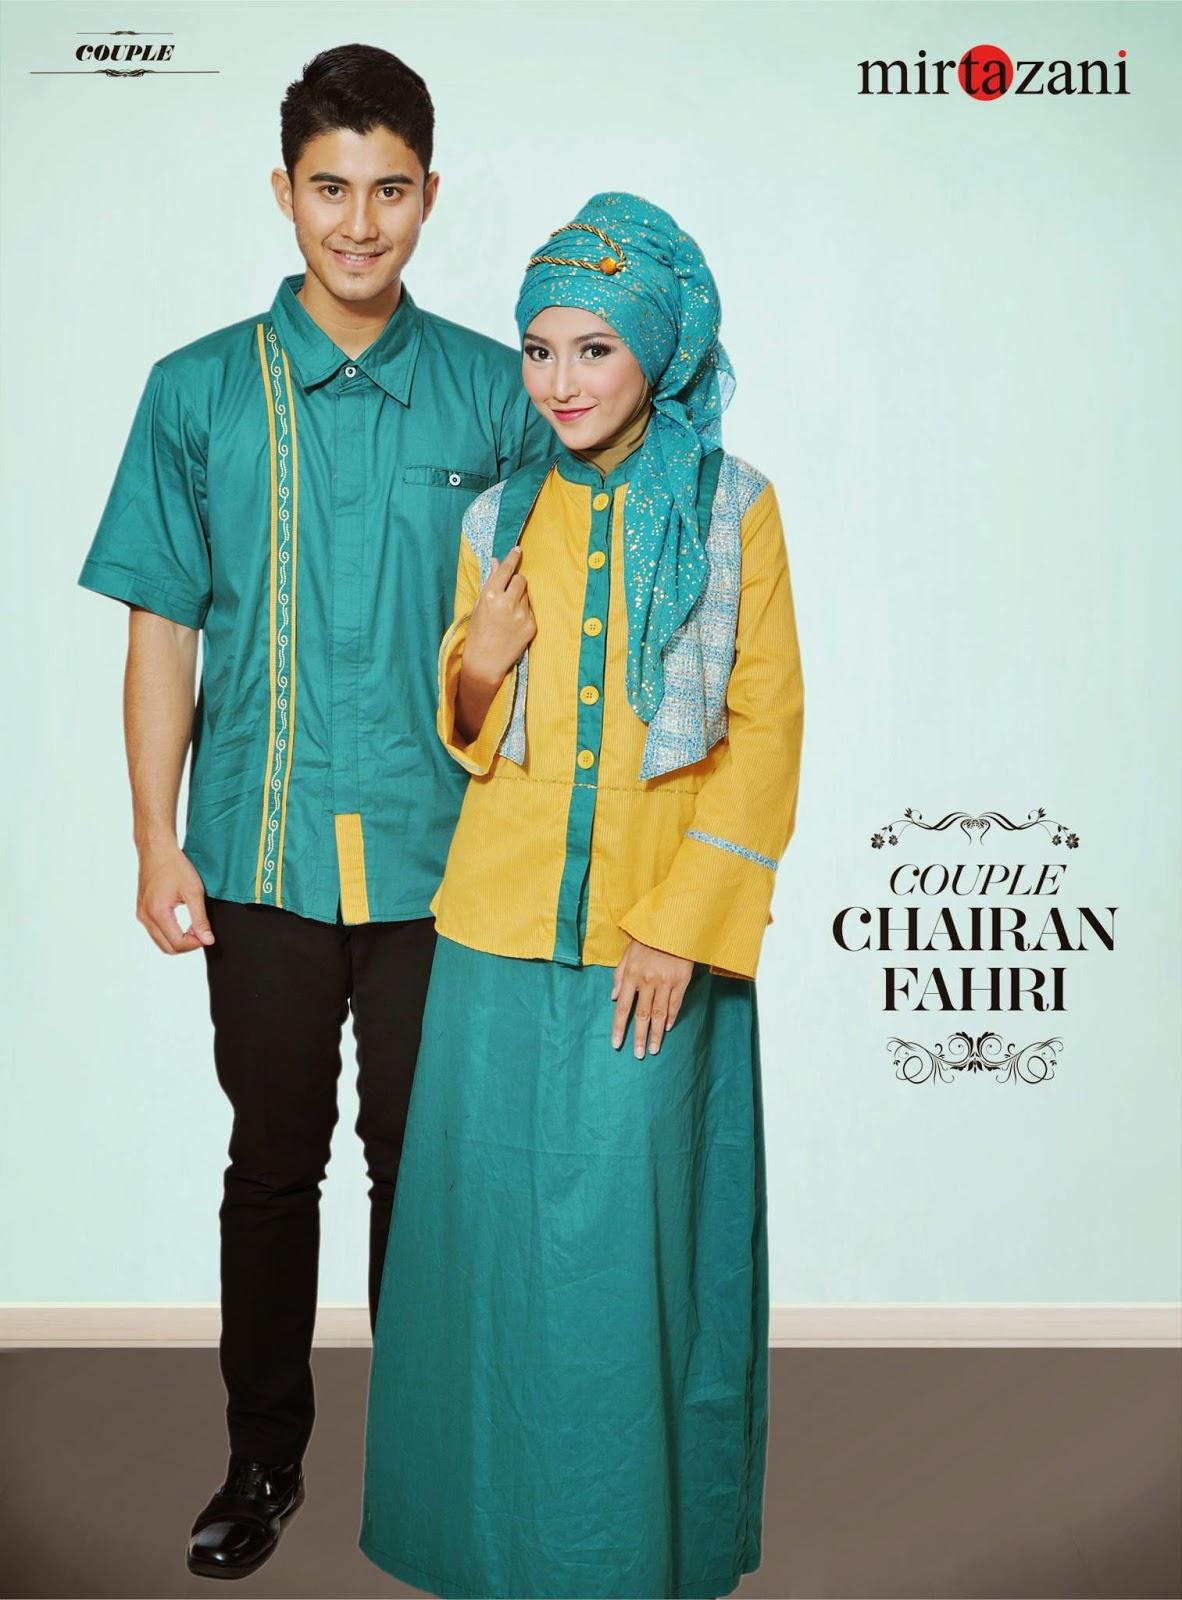 Gamis Cantik Mirtazani Baju Muslim